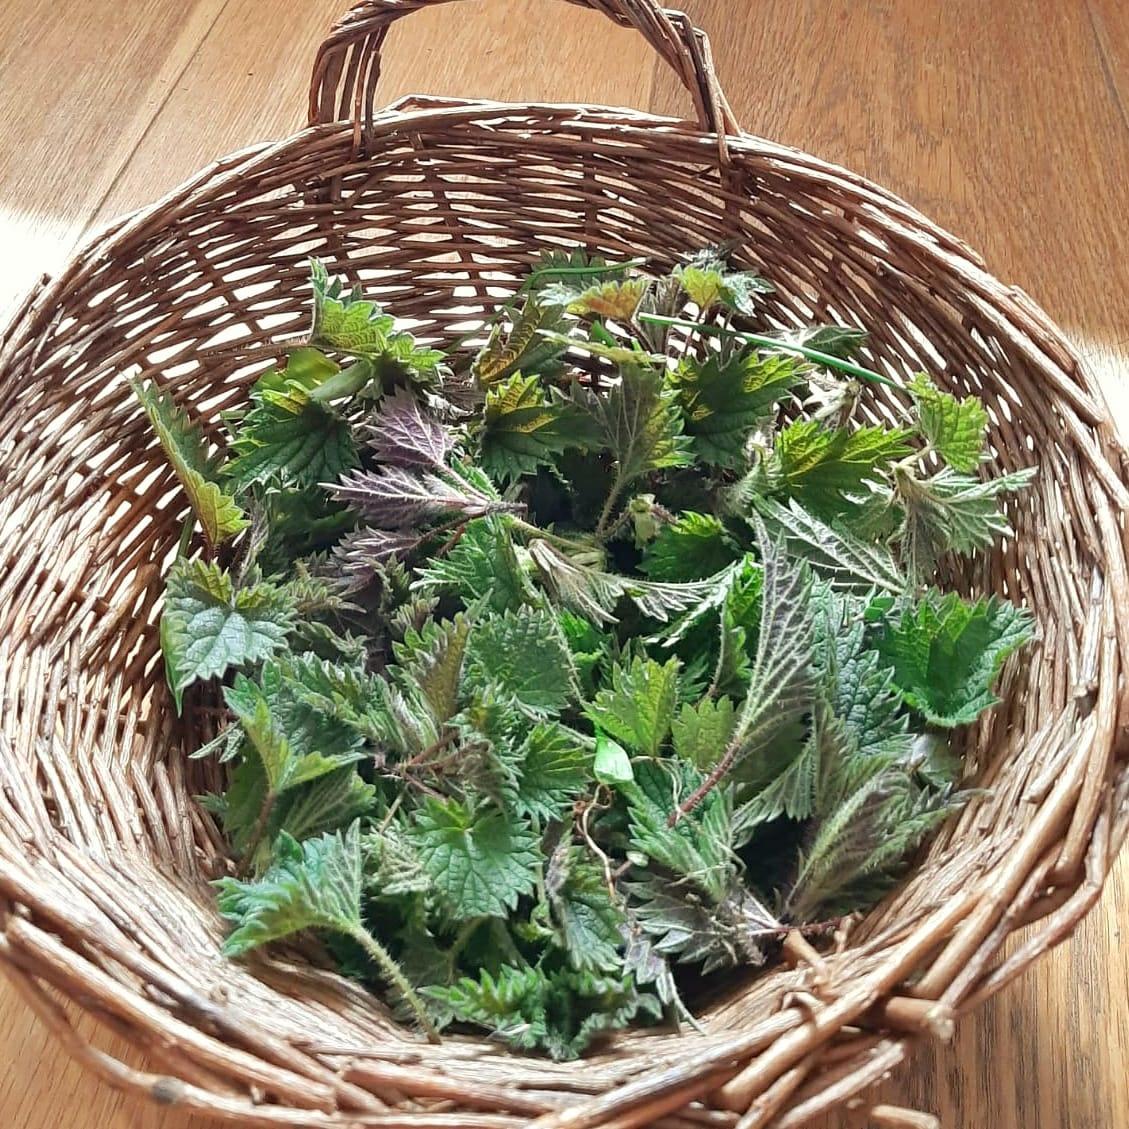 Basket of Baby Nettle Leaves